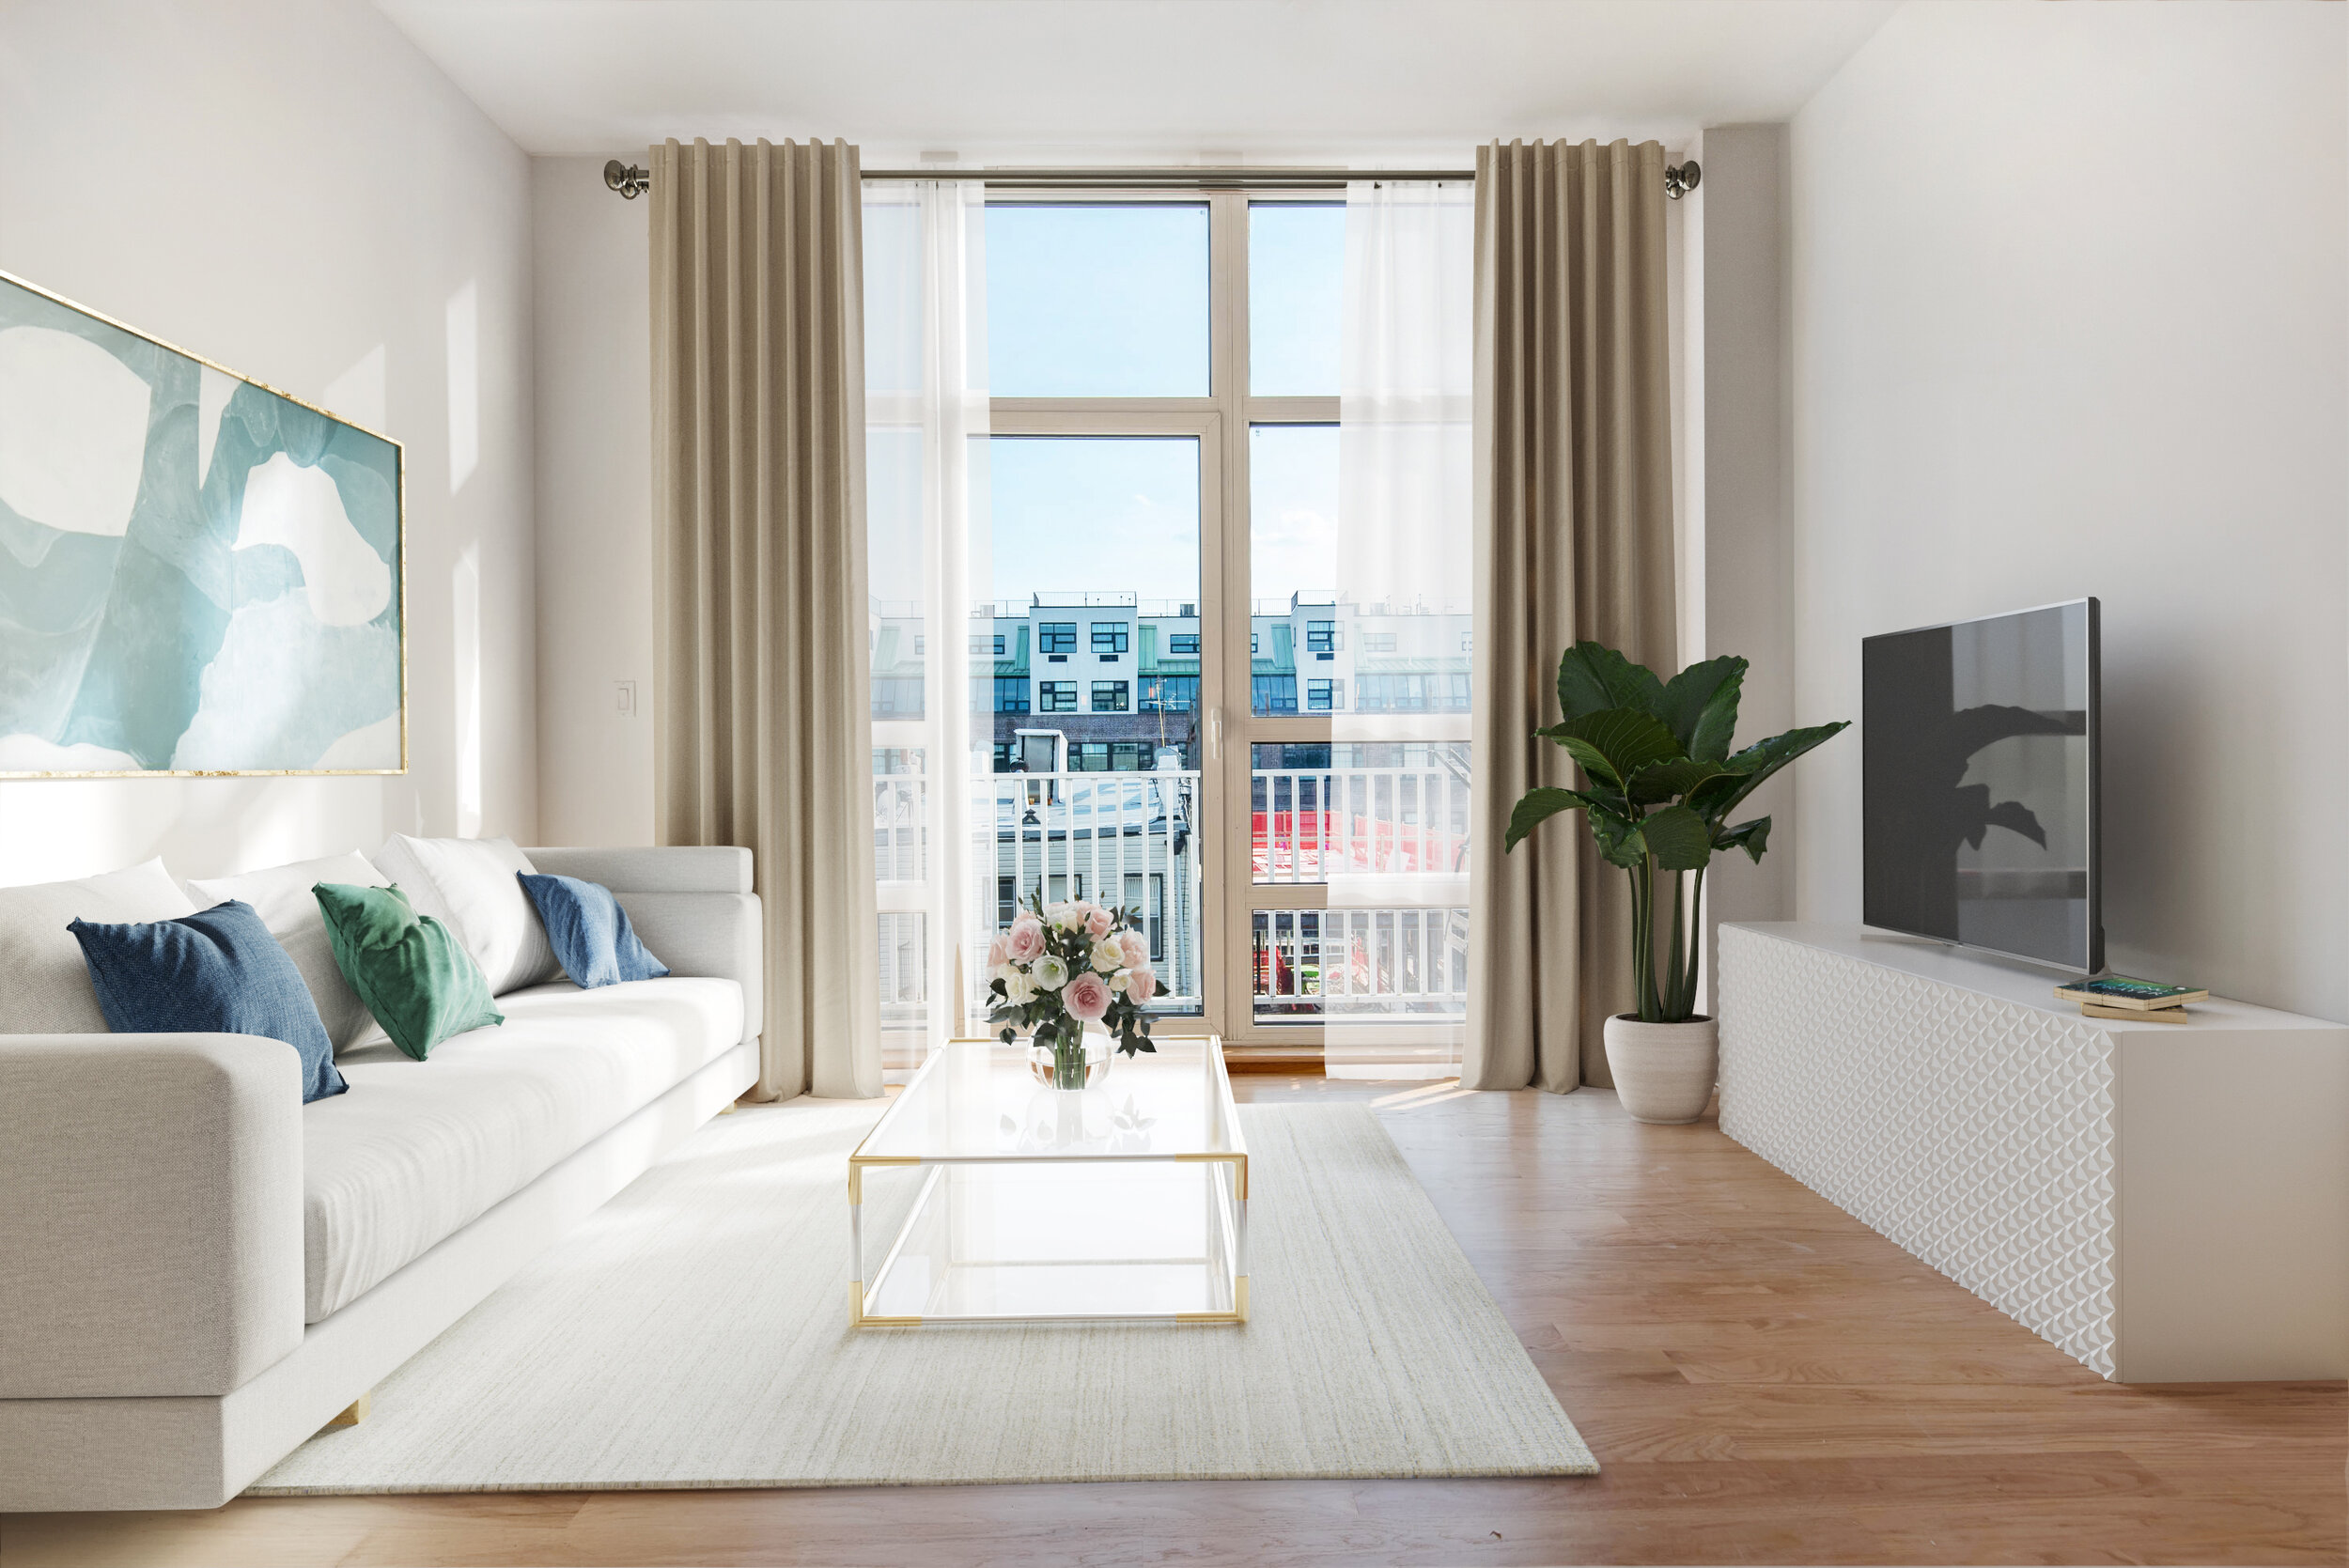 90 North 5th St #4D - Williamsburg | Brooklyn    2 Bedroom // 2 Bath Days on Market — 40 Sold Price:    $1,090,000